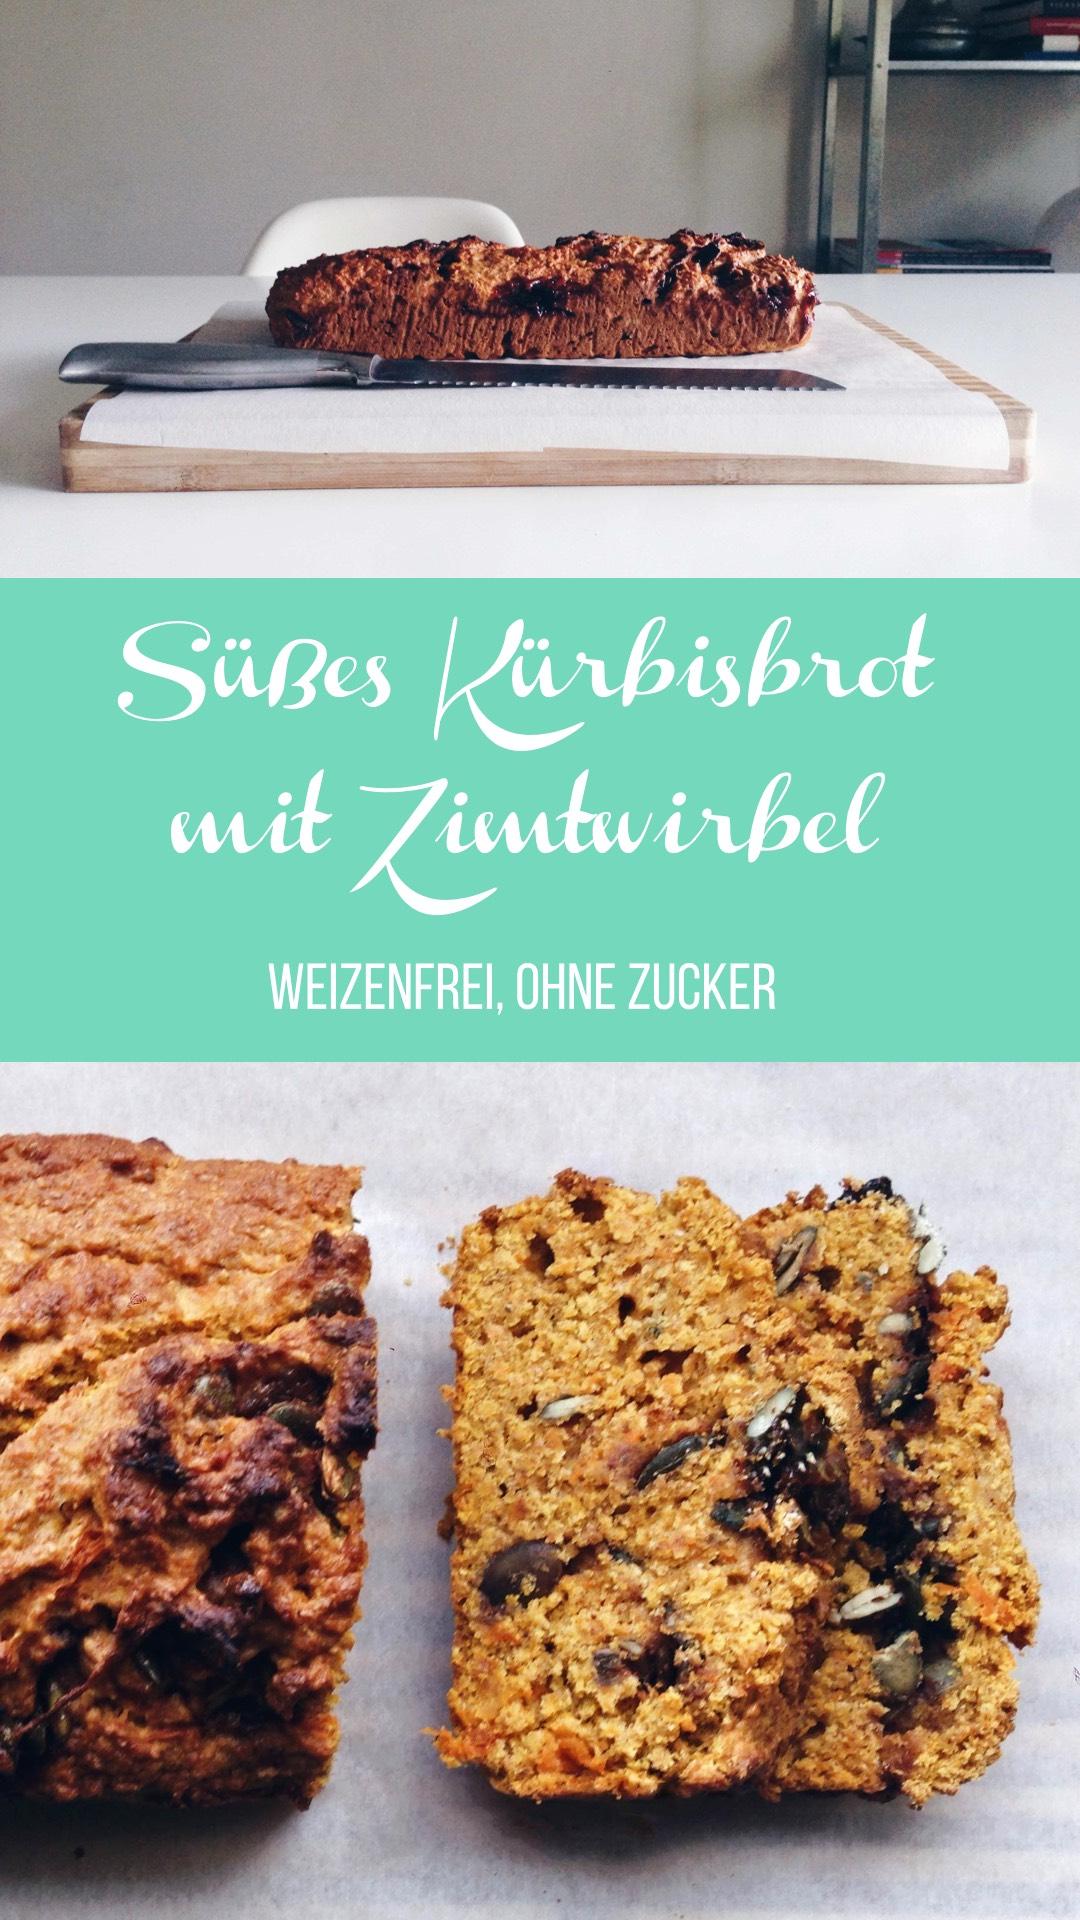 Sugarfree Sweet Pumpkin Spelt Bread with a Cinnamon Swirl // Süßes Kürbis-Dinkelbrot mit Zimtwirbel ohne Zucker // fructopia.de